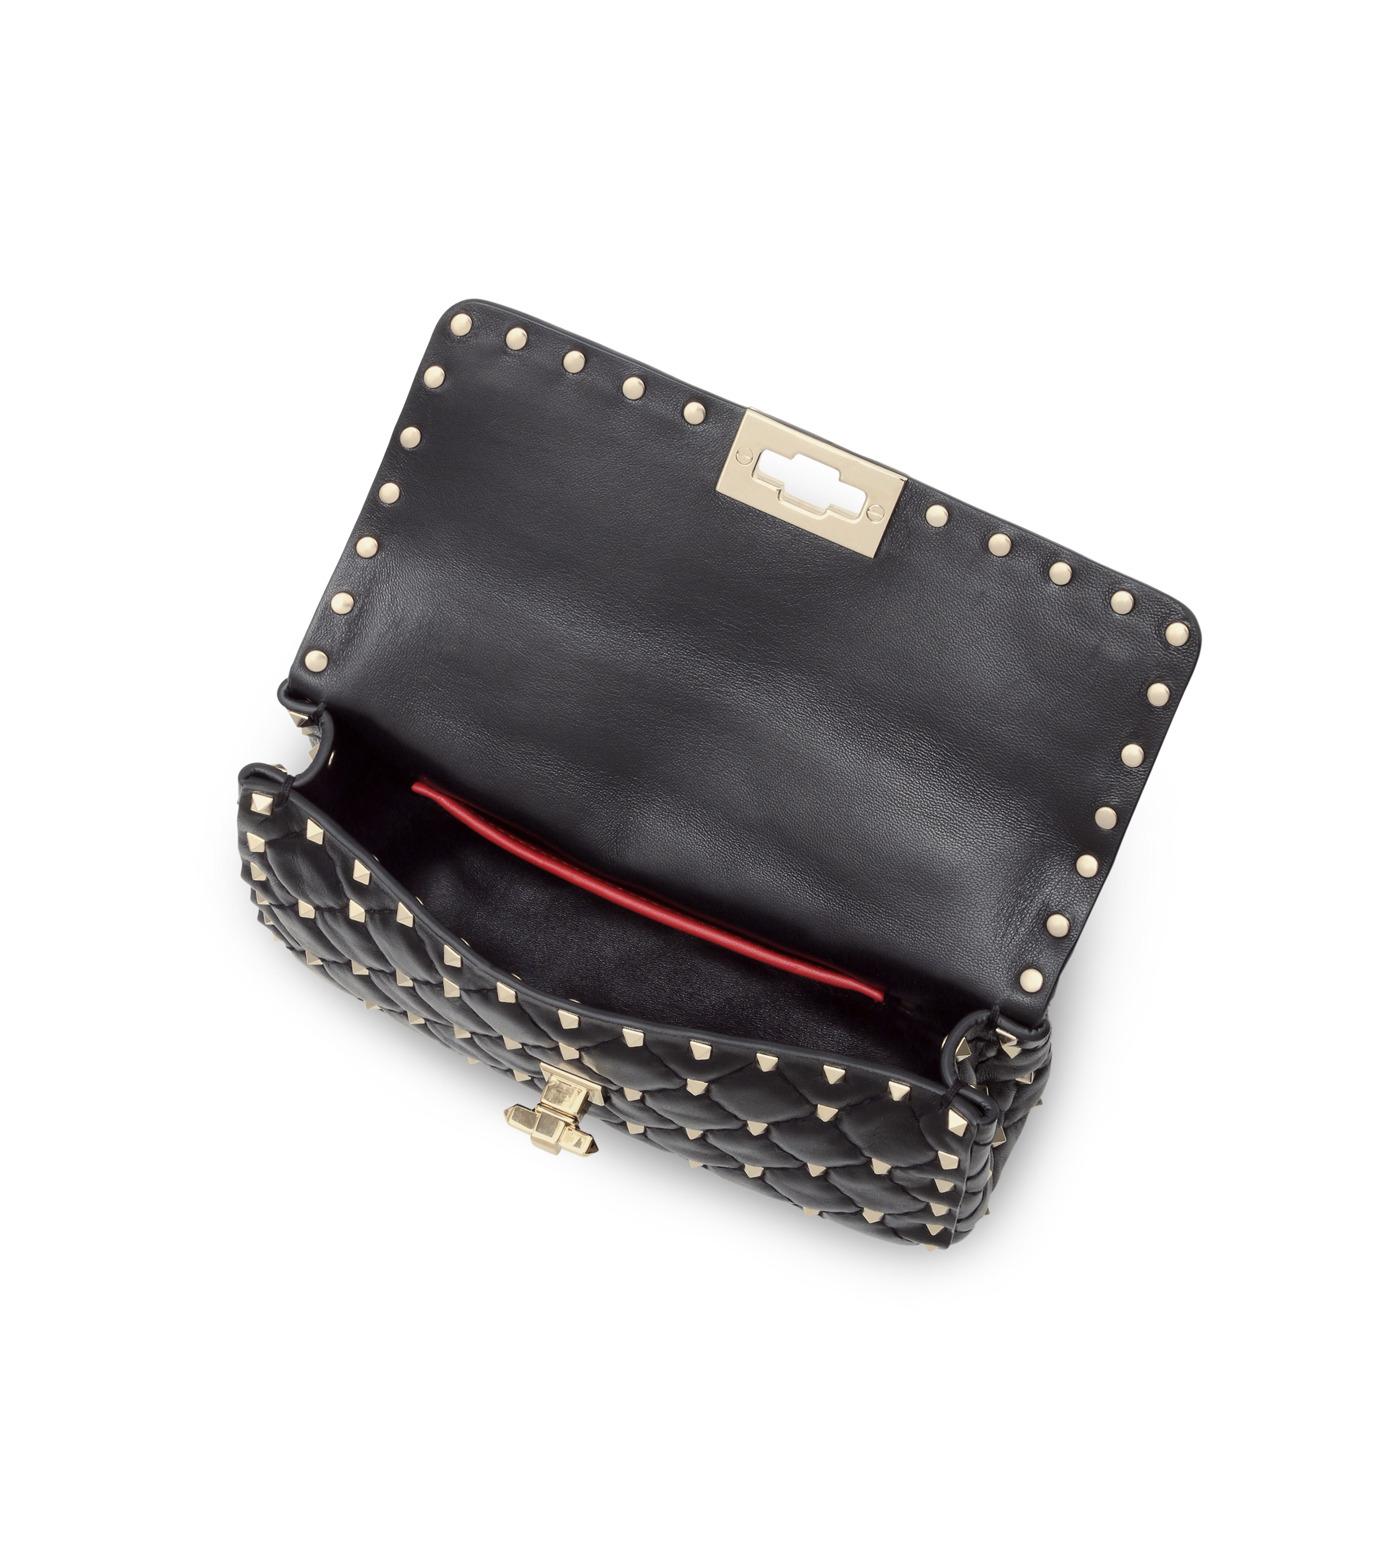 VALENTINO GARAVANI(ヴァレンティノ ガラヴァーニ)のRockstud Matelasse Small-BLACK(ショルダーバッグ/shoulder bag)-LW0B0123NAP-13 拡大詳細画像4